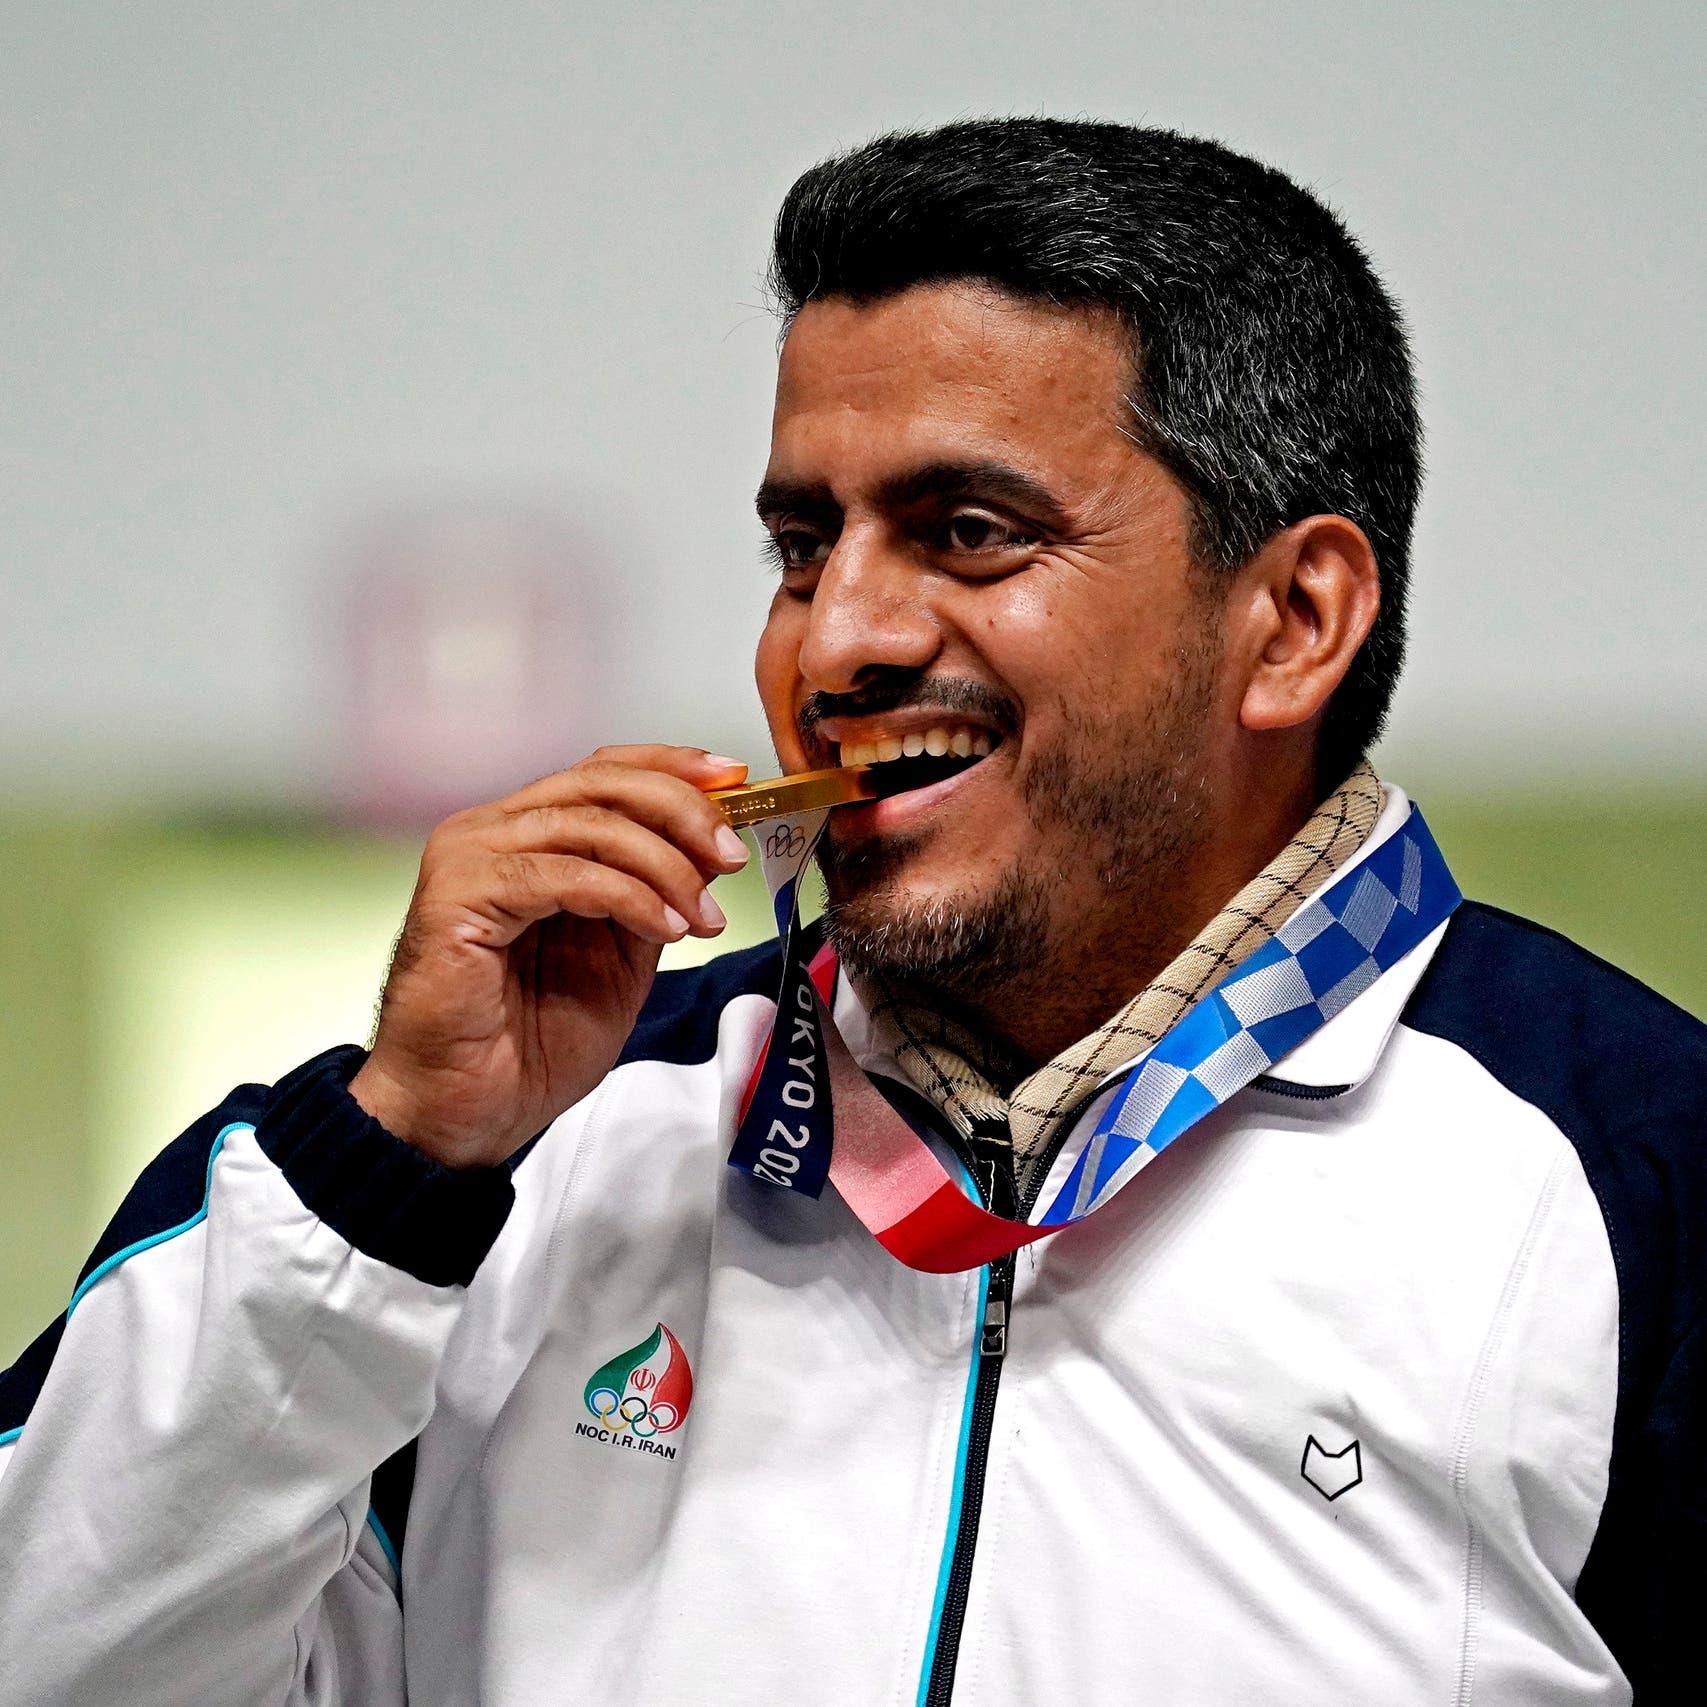 Tokyo Olympics: IRGC member wins Iran's first gold, dedicates medal to Khamenei